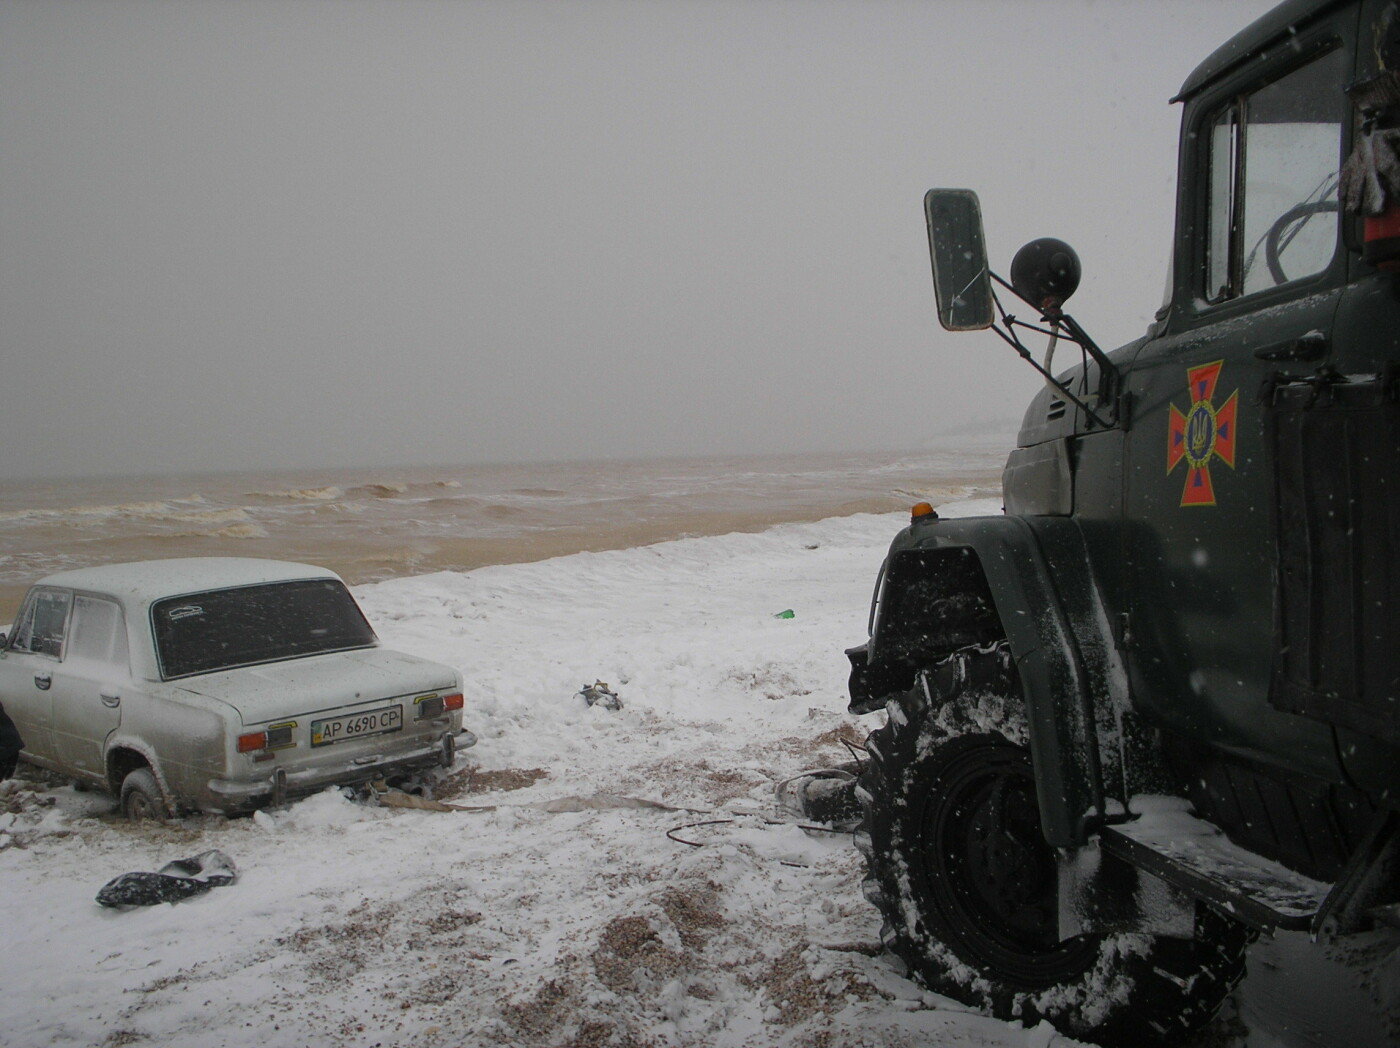 В Запорожской области машина застряла в песке и снегу: доставали спасатели, - ФОТО, фото-1